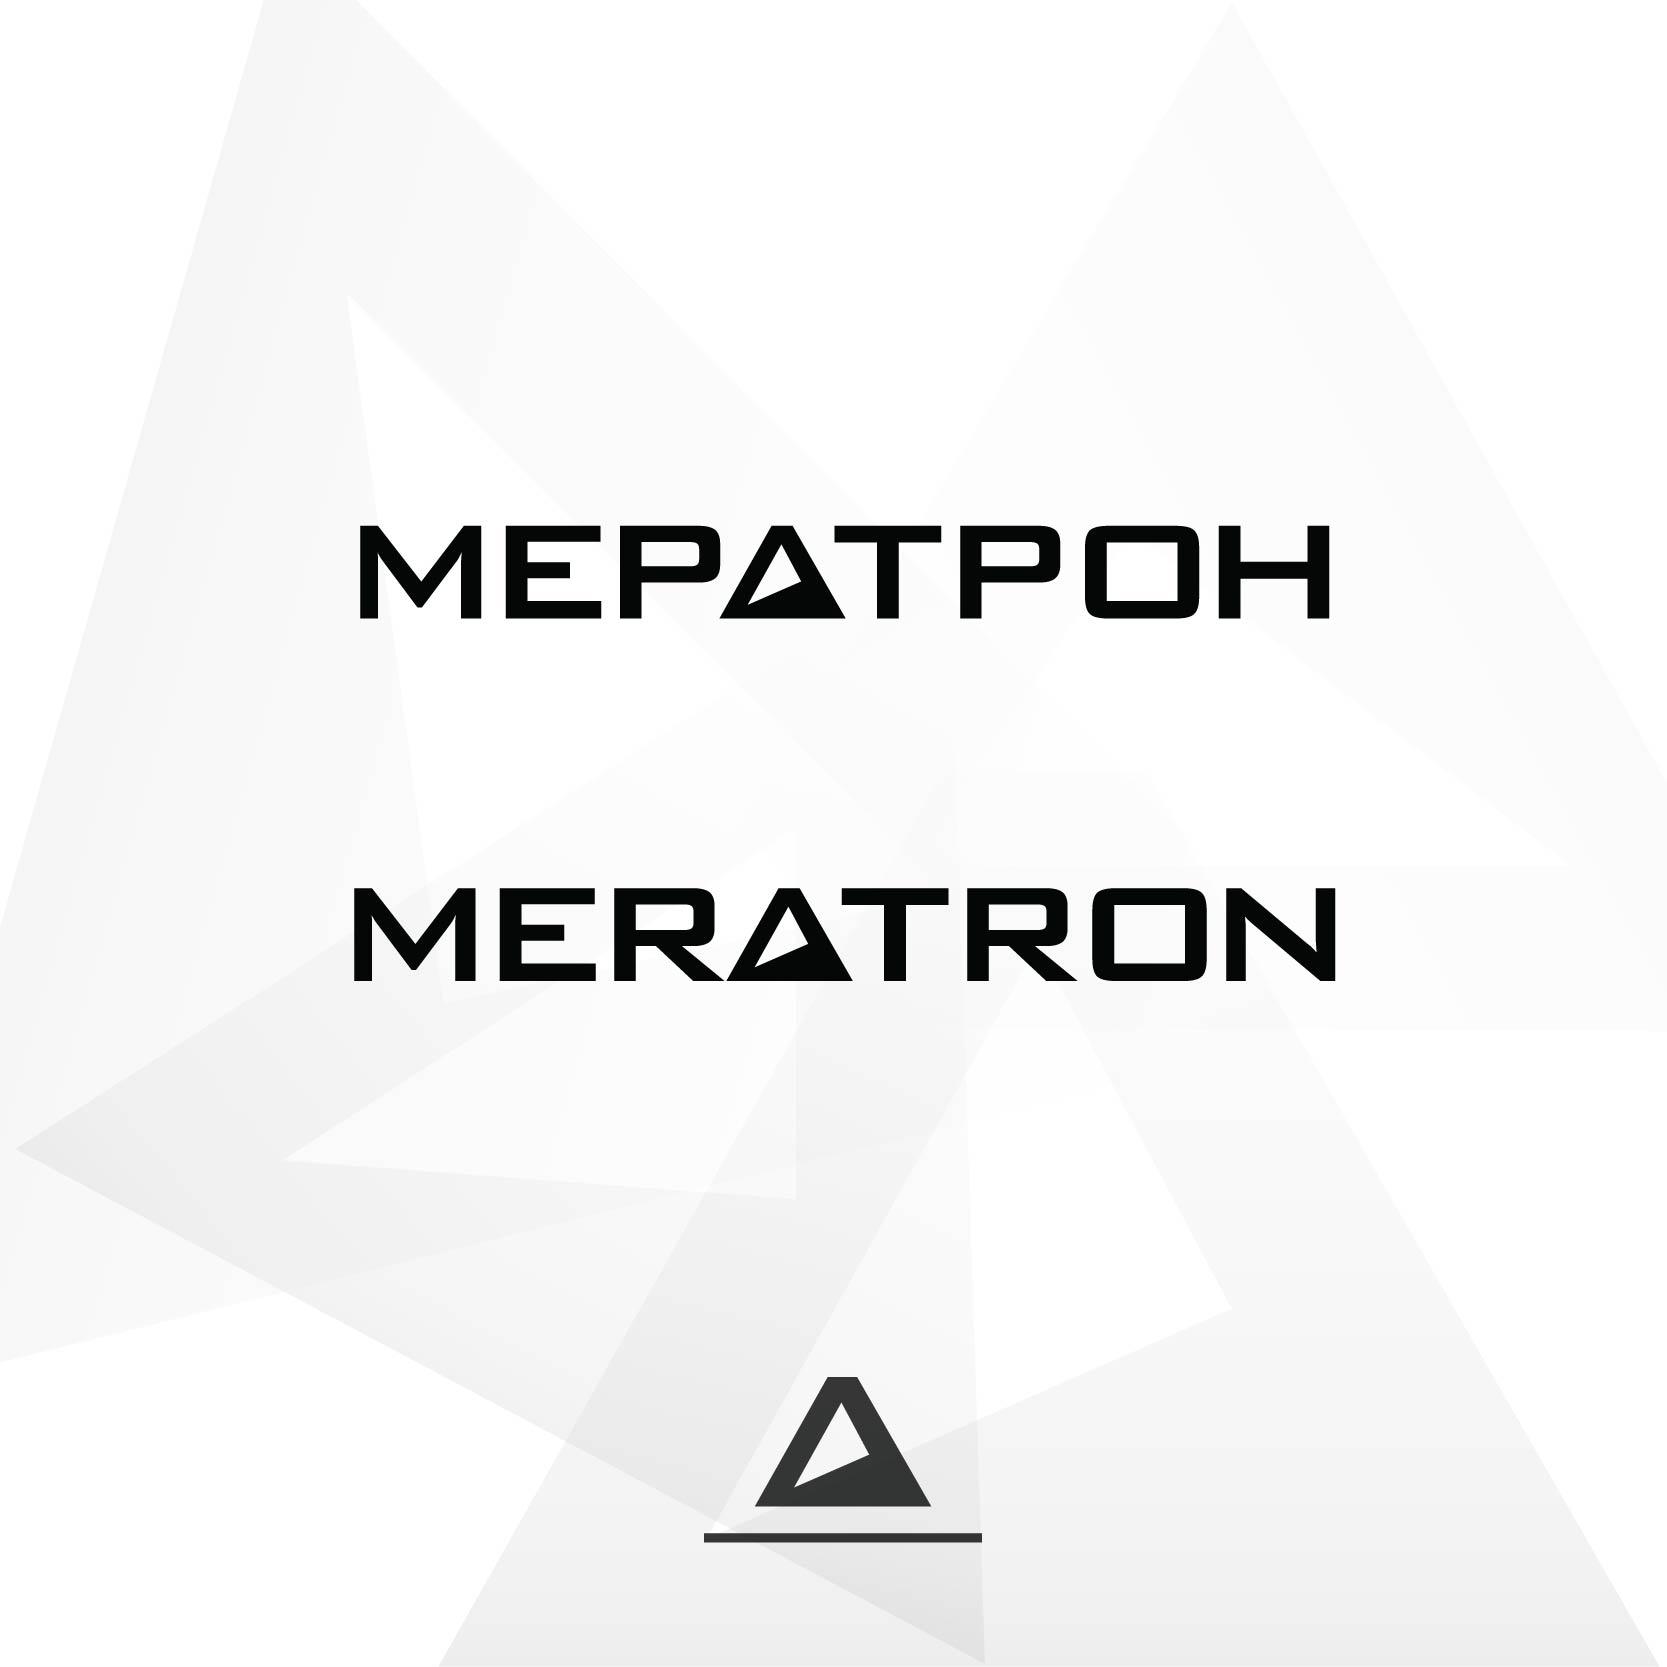 Разработать логотип организации фото f_4f1161220d175.jpg